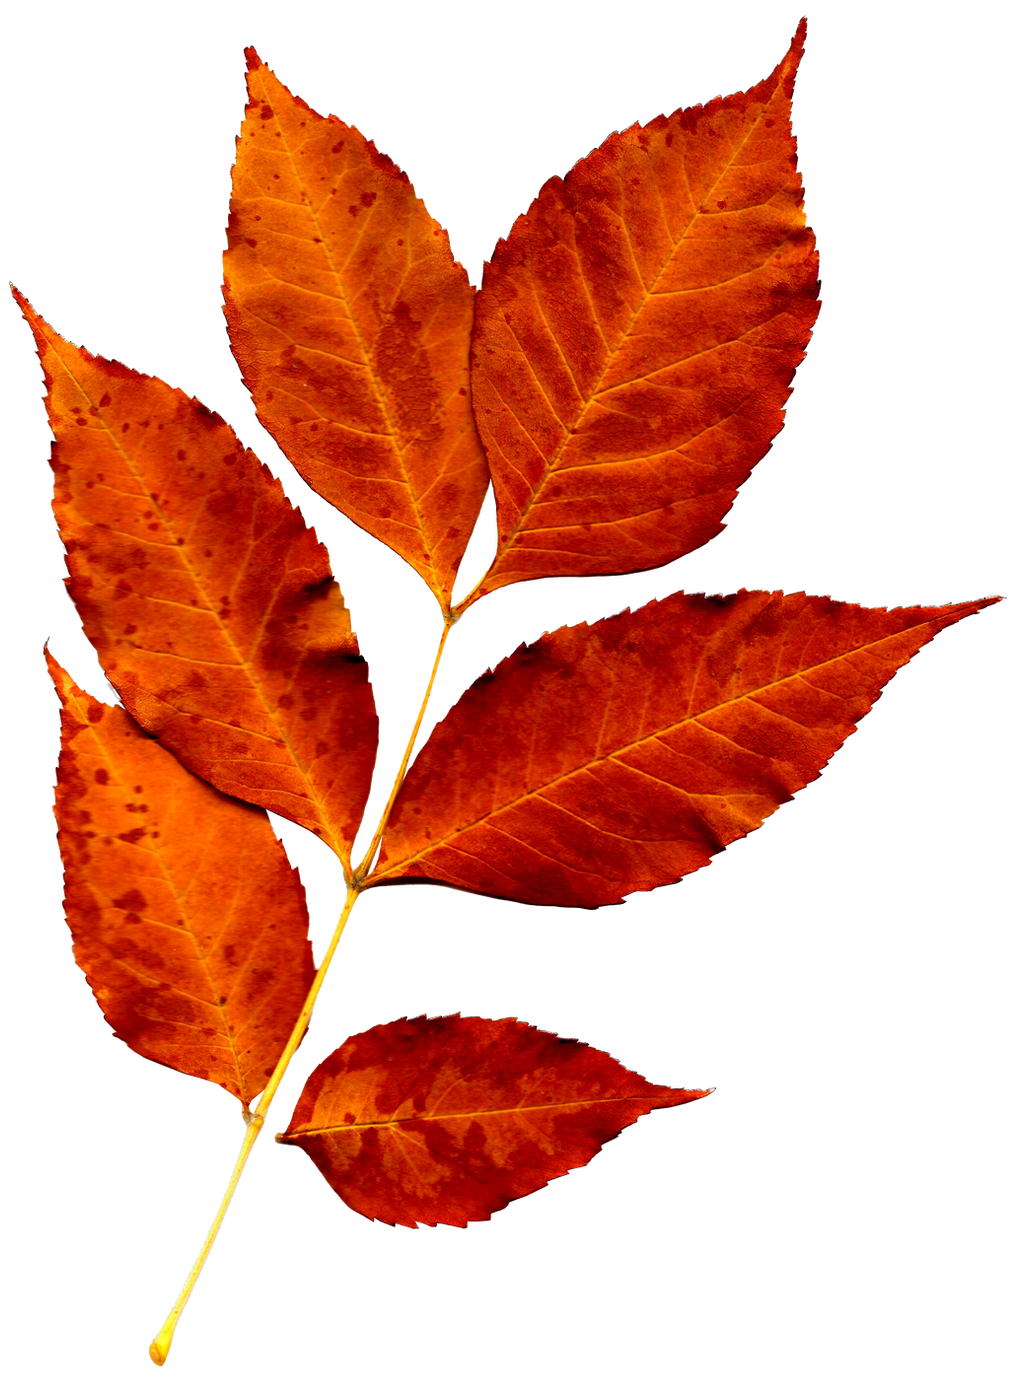 Autumn, leaves [png] by nastyalovekorea on DeviantArt